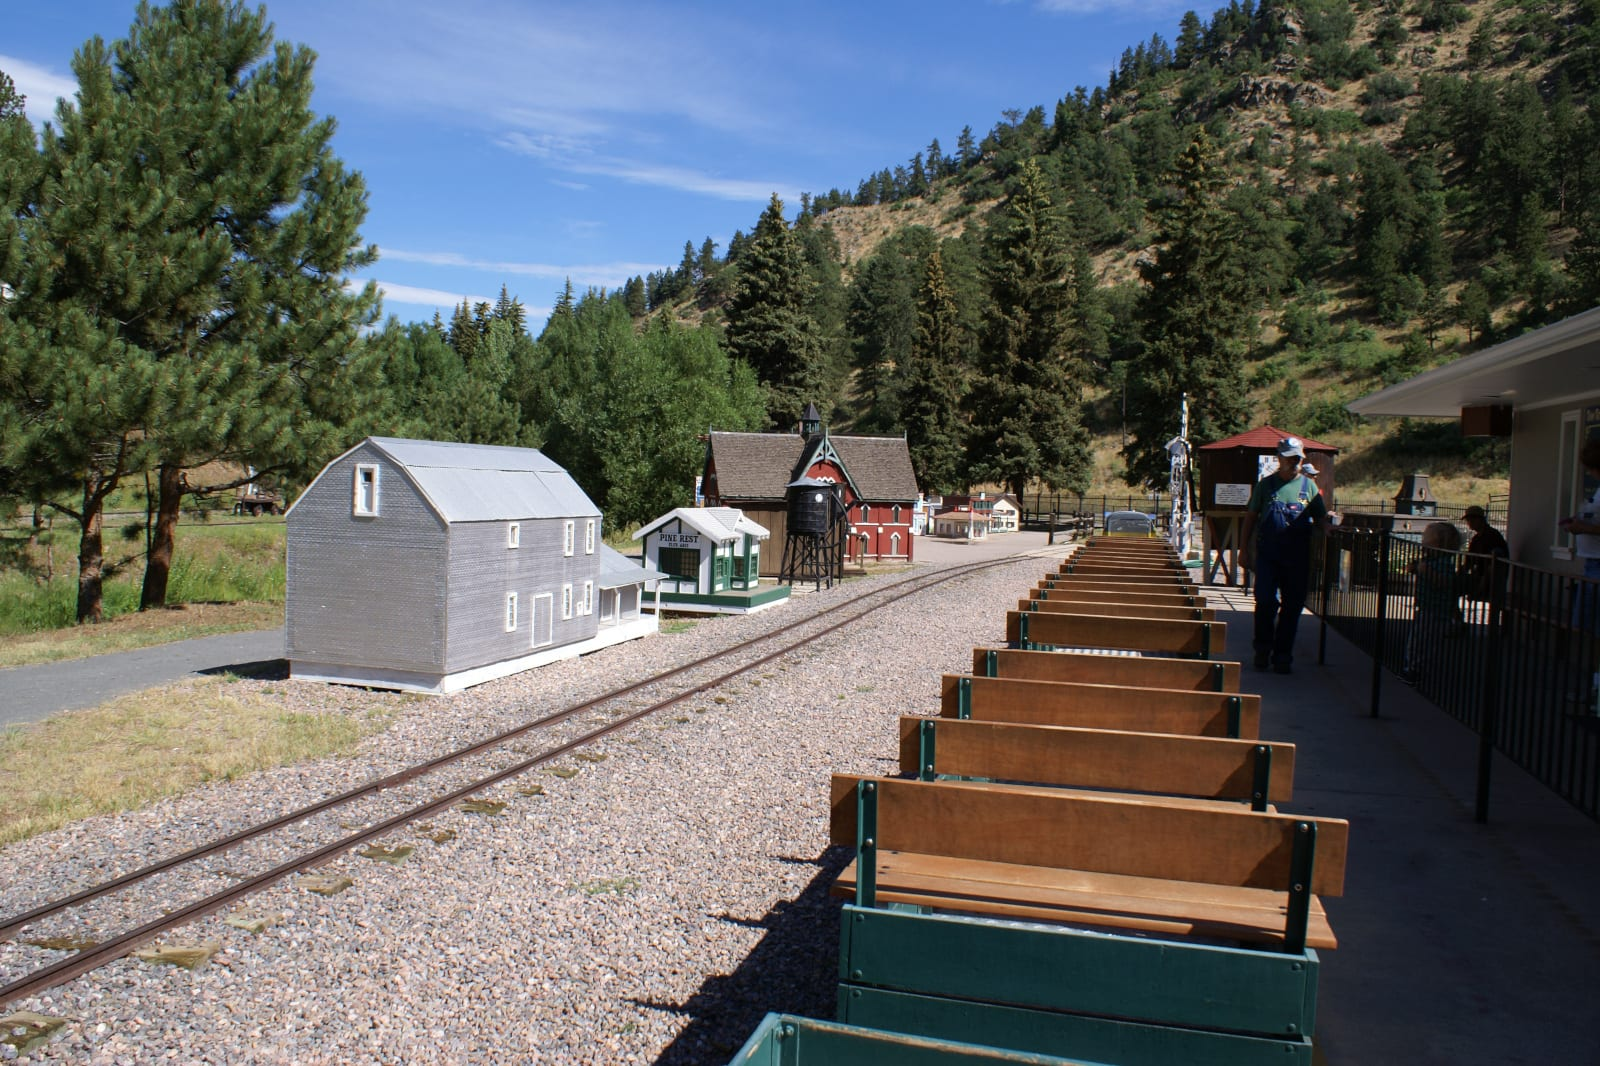 Tiny Town Railroad Morrison Train Ride Platform